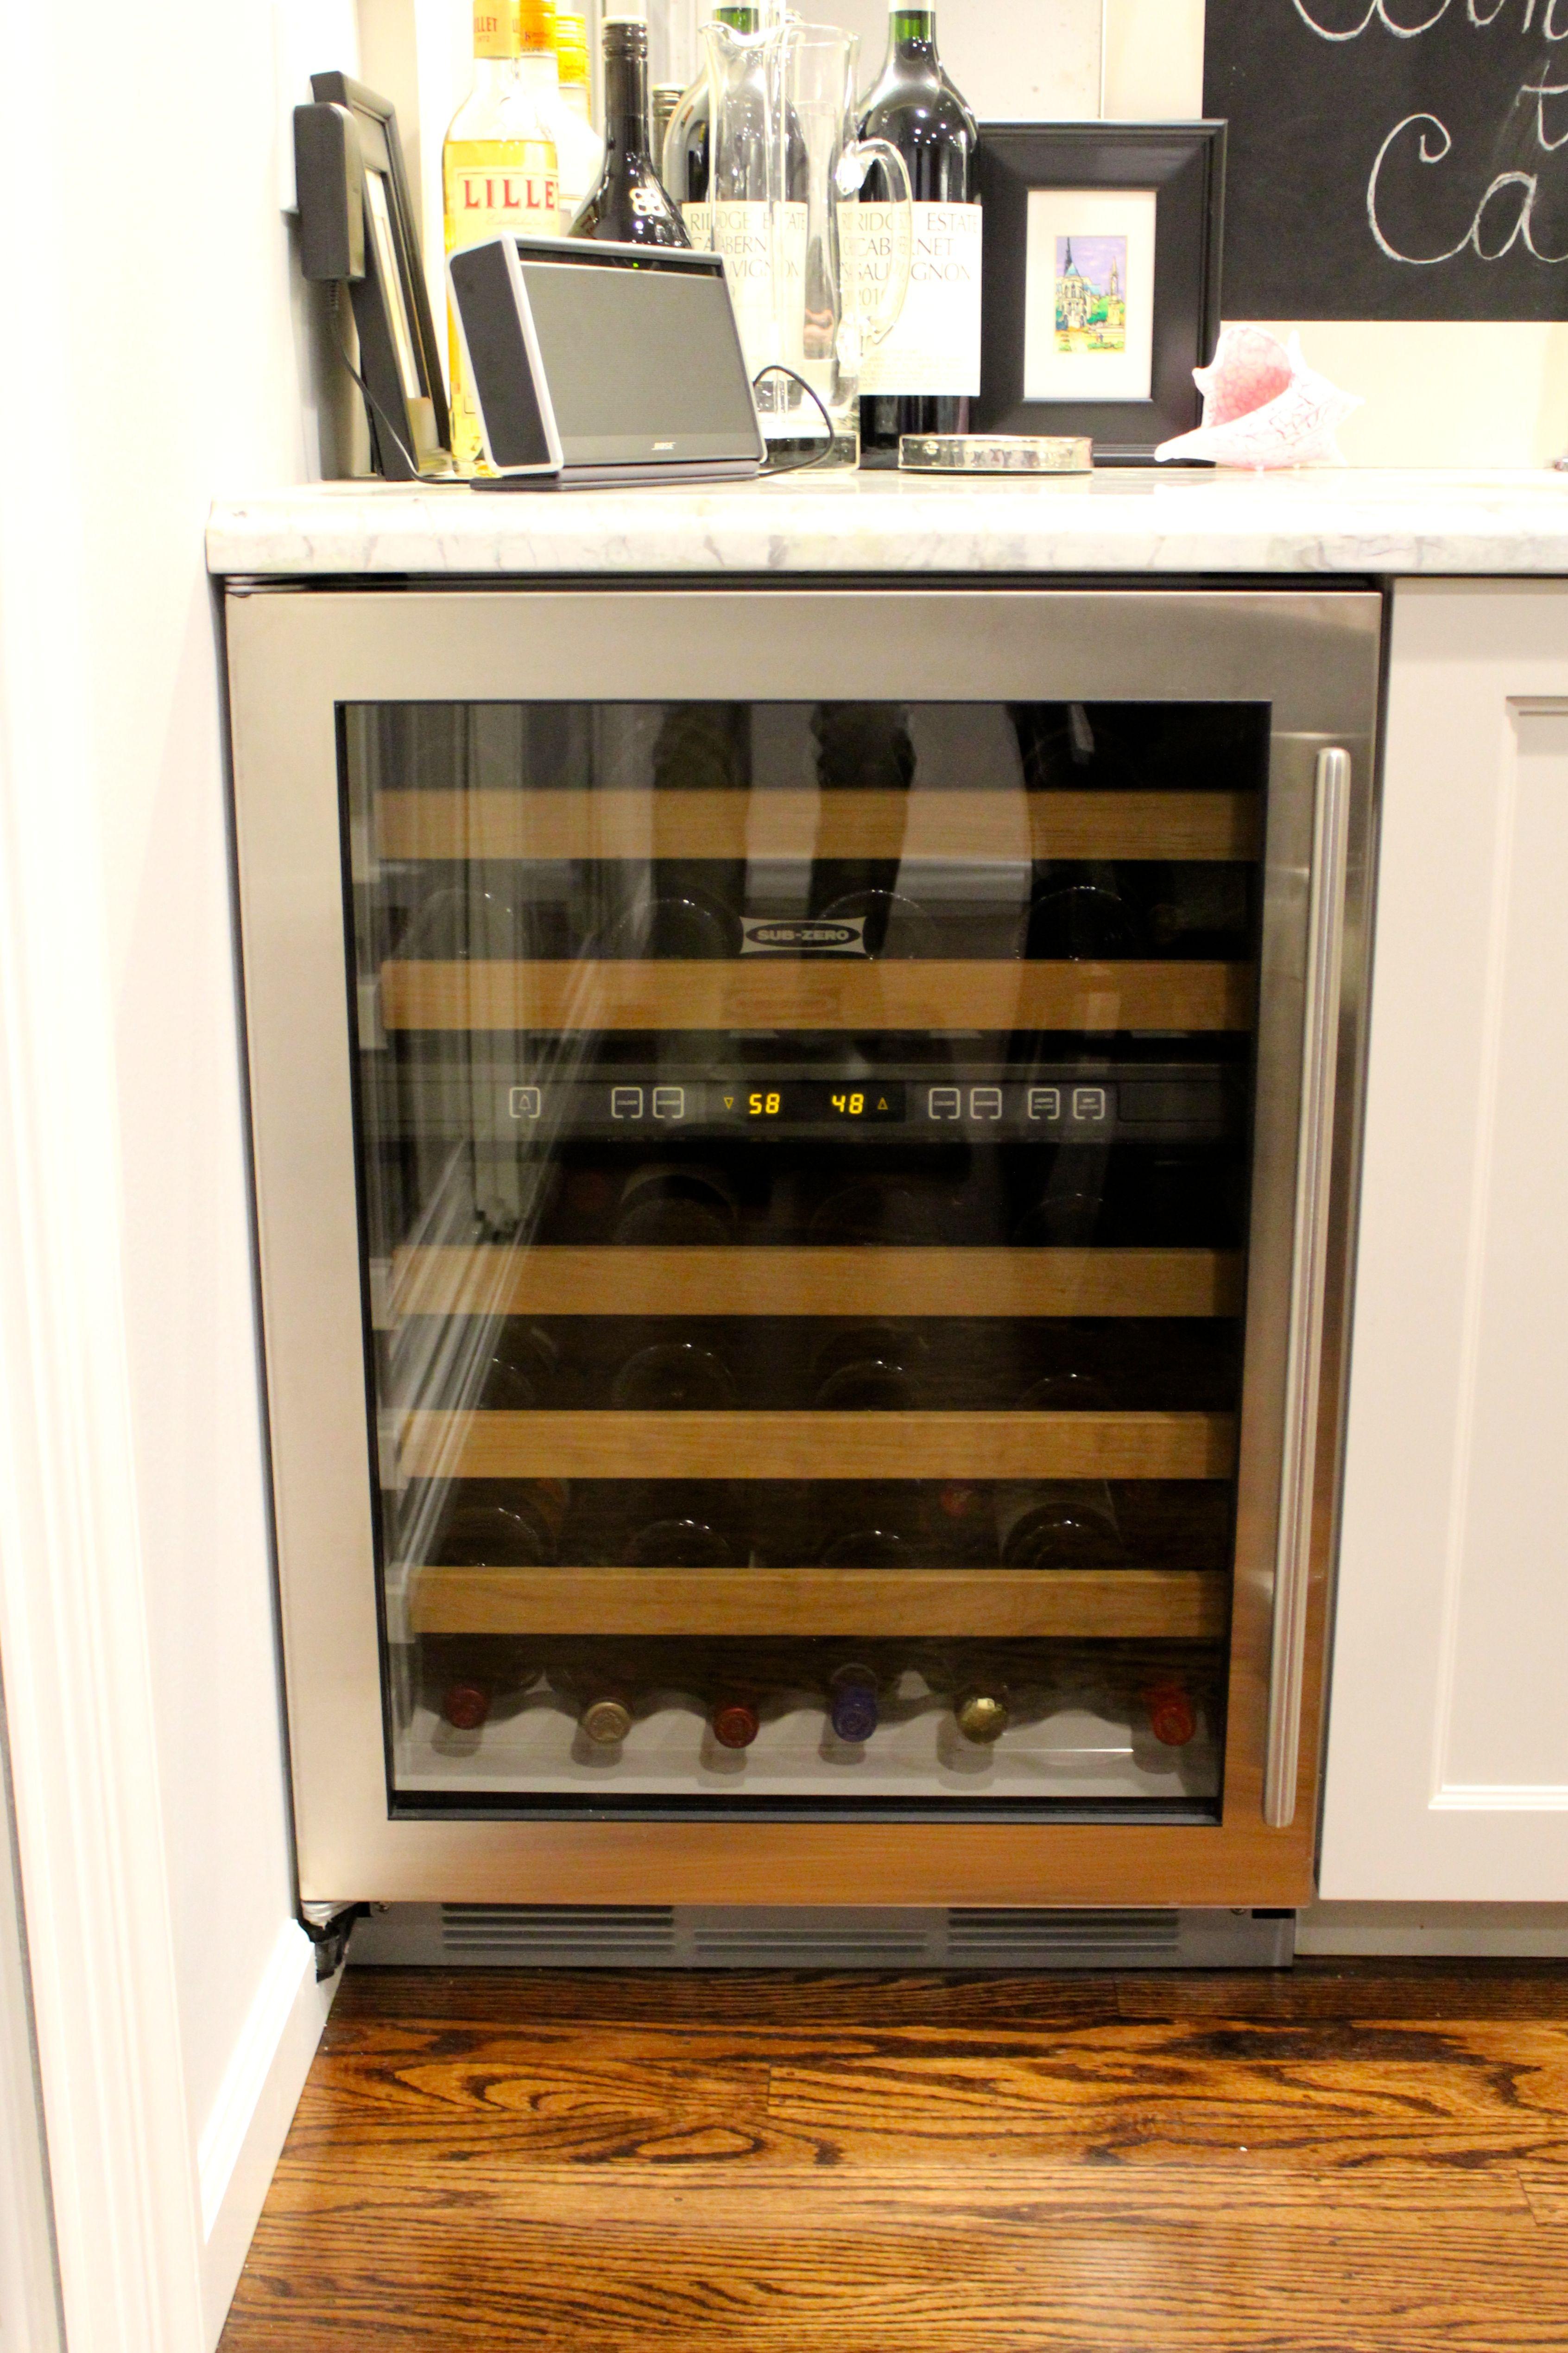 drawers freezer refrigerators guide cu hinge buyer sub agp august zero s appliance top integrated